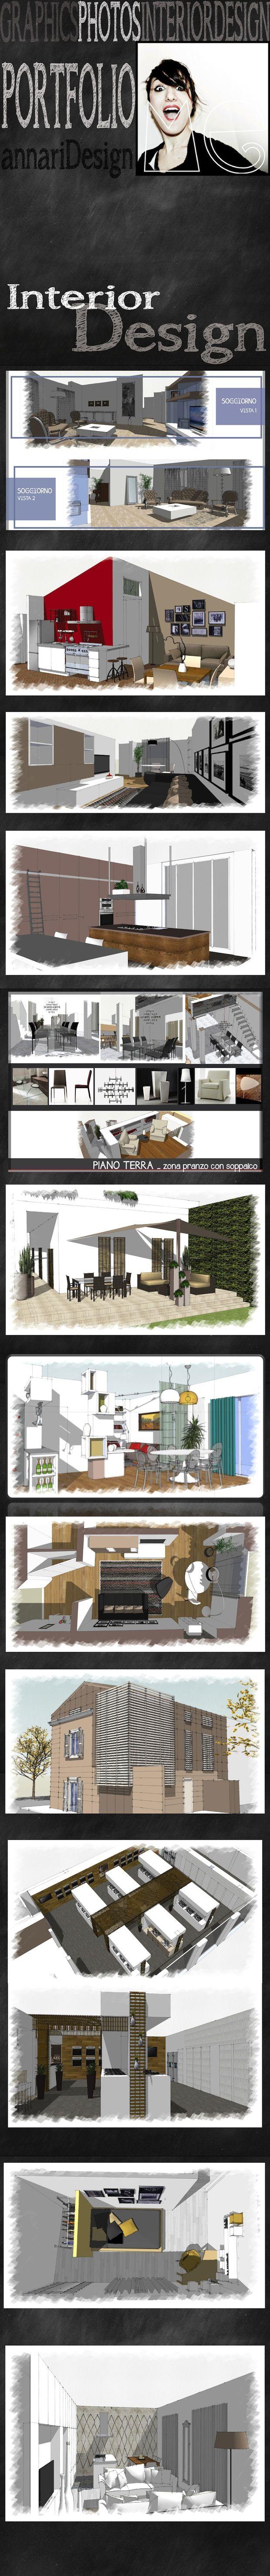 fifteen Interior design Graphic design